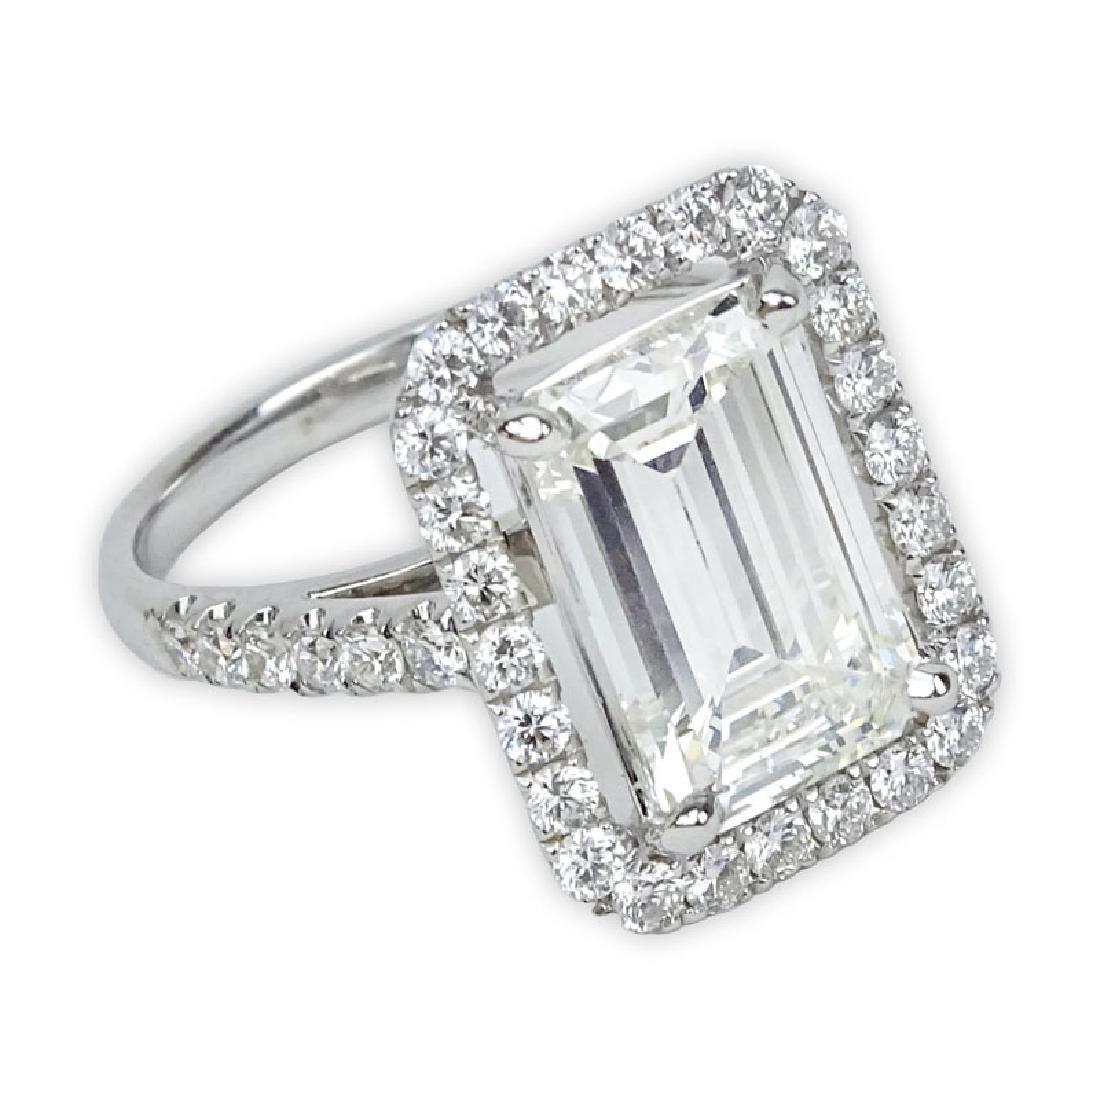 GIA Certified 3.70 Carat Emerald Cut Diamond and 18